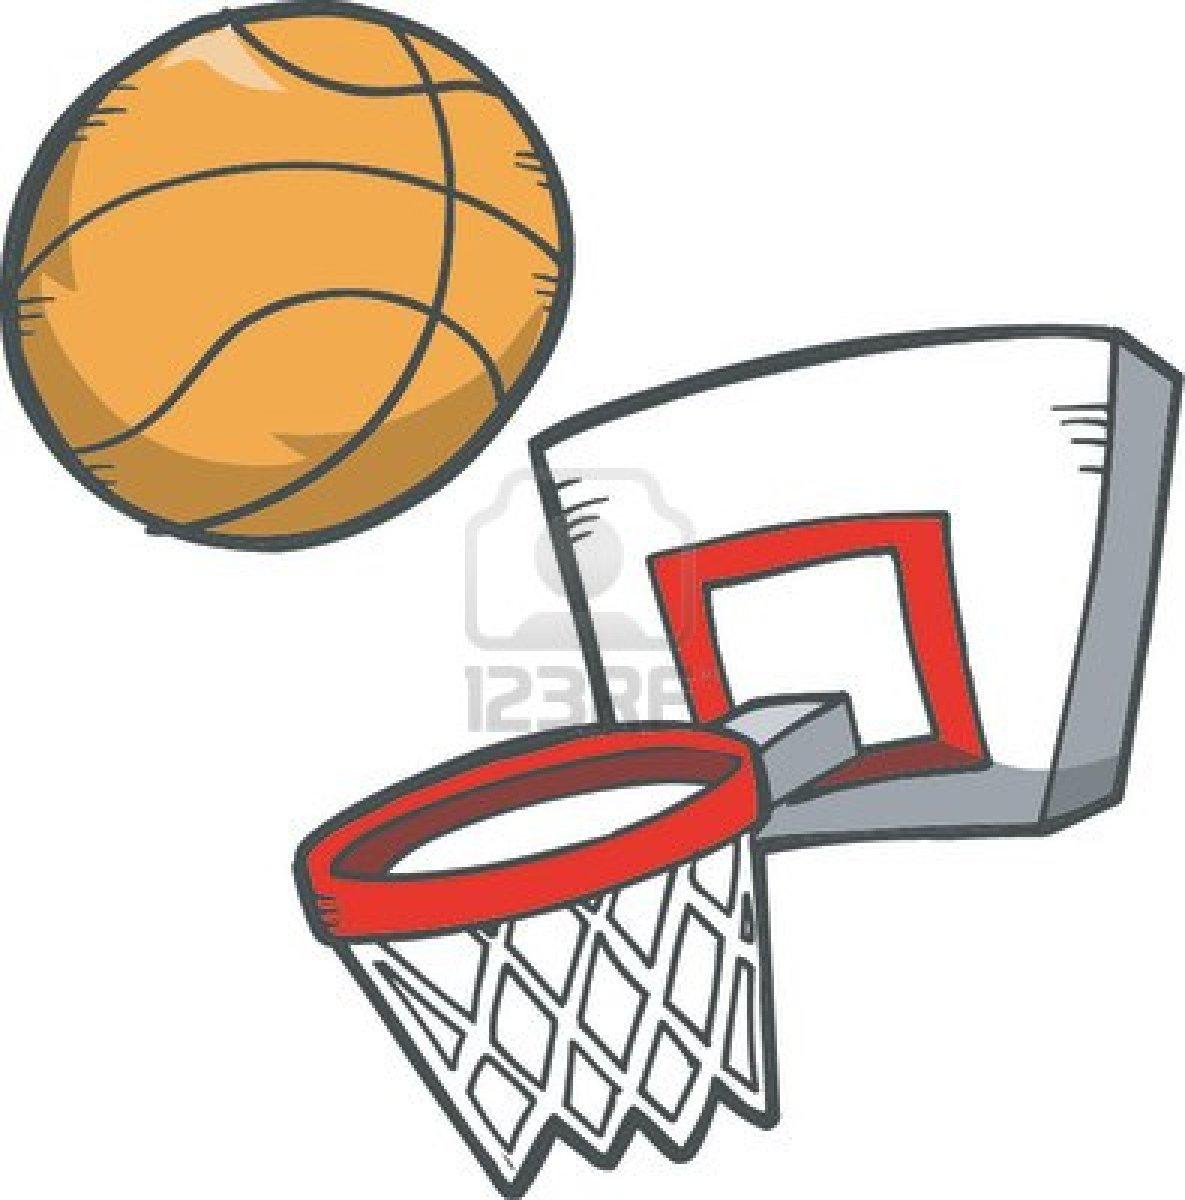 Basketball Rim Clip Art-Basketball Rim Clip Art-17